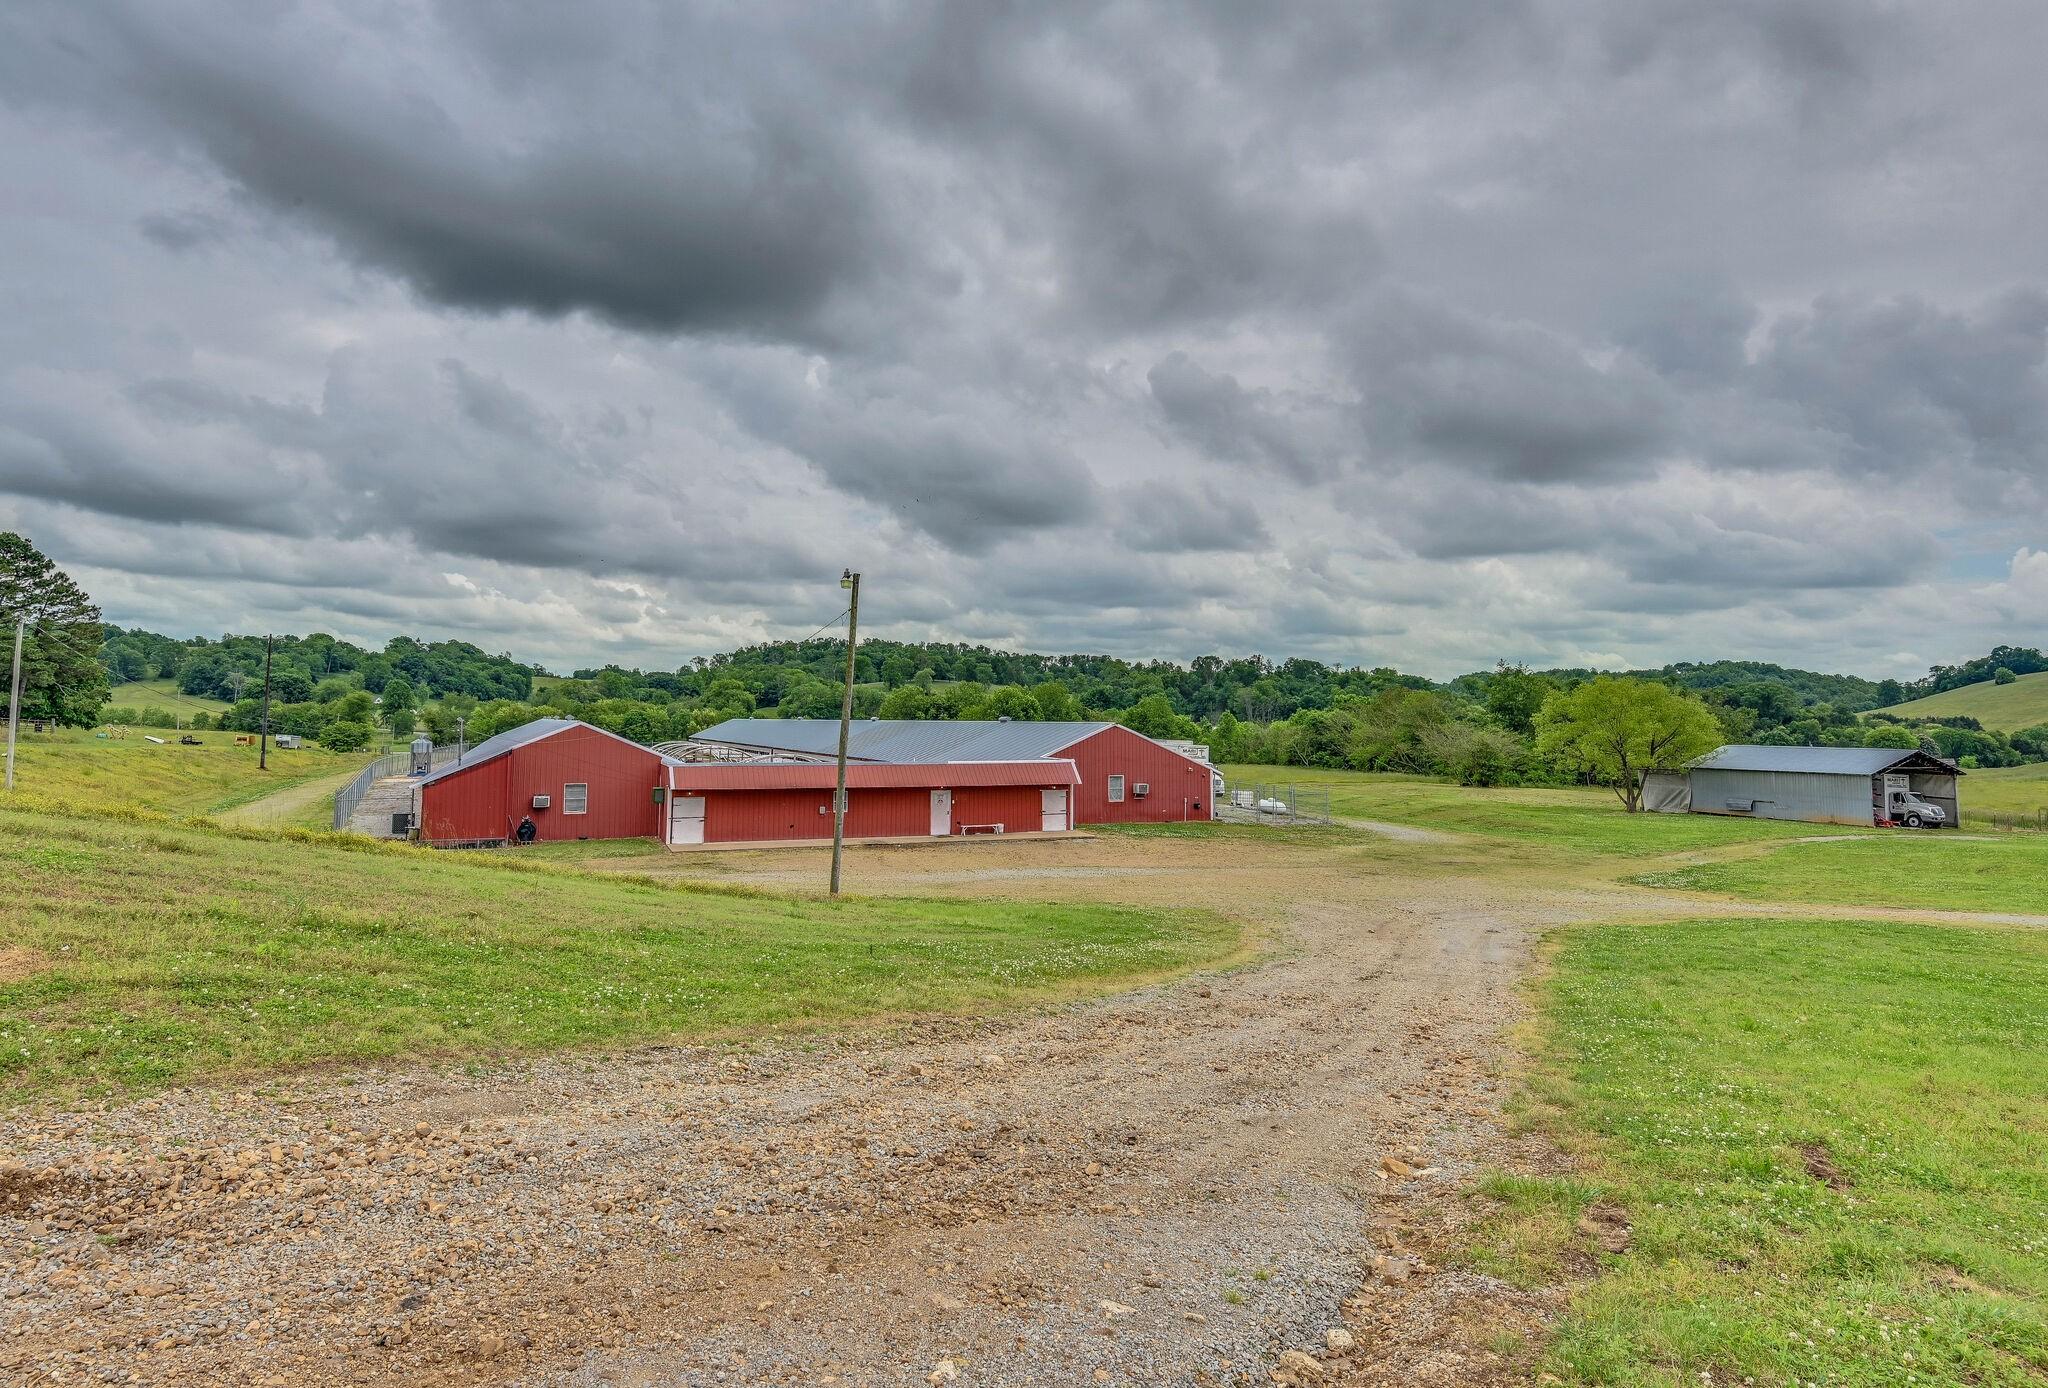 725 Shady Ln, Pulaski, TN 38478 - Pulaski, TN real estate listing